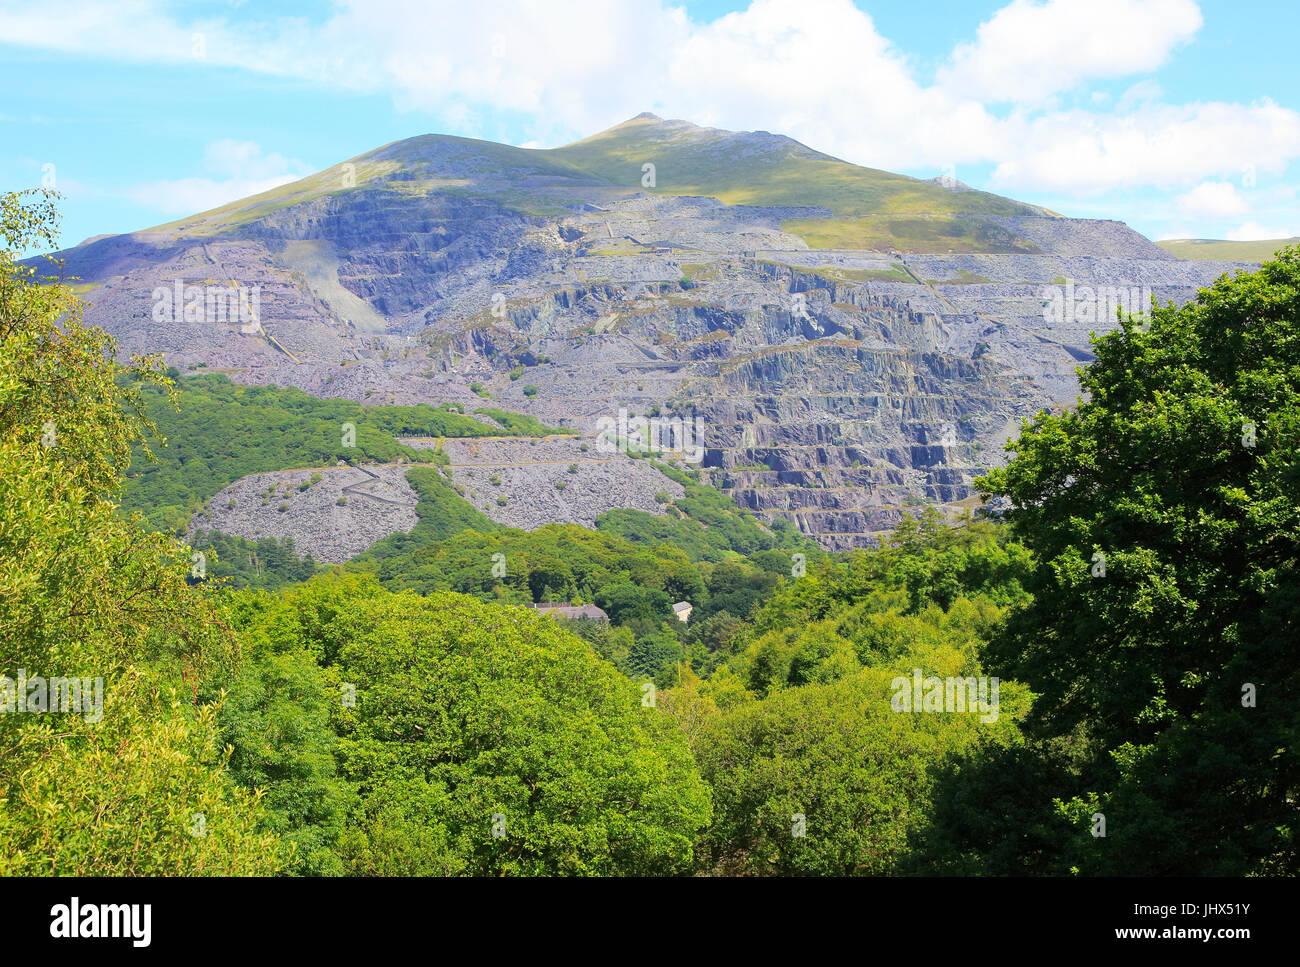 Slate quarries at Llanberis, Snowdonia, north Wales, UK view down to Llanberis Stock Photo